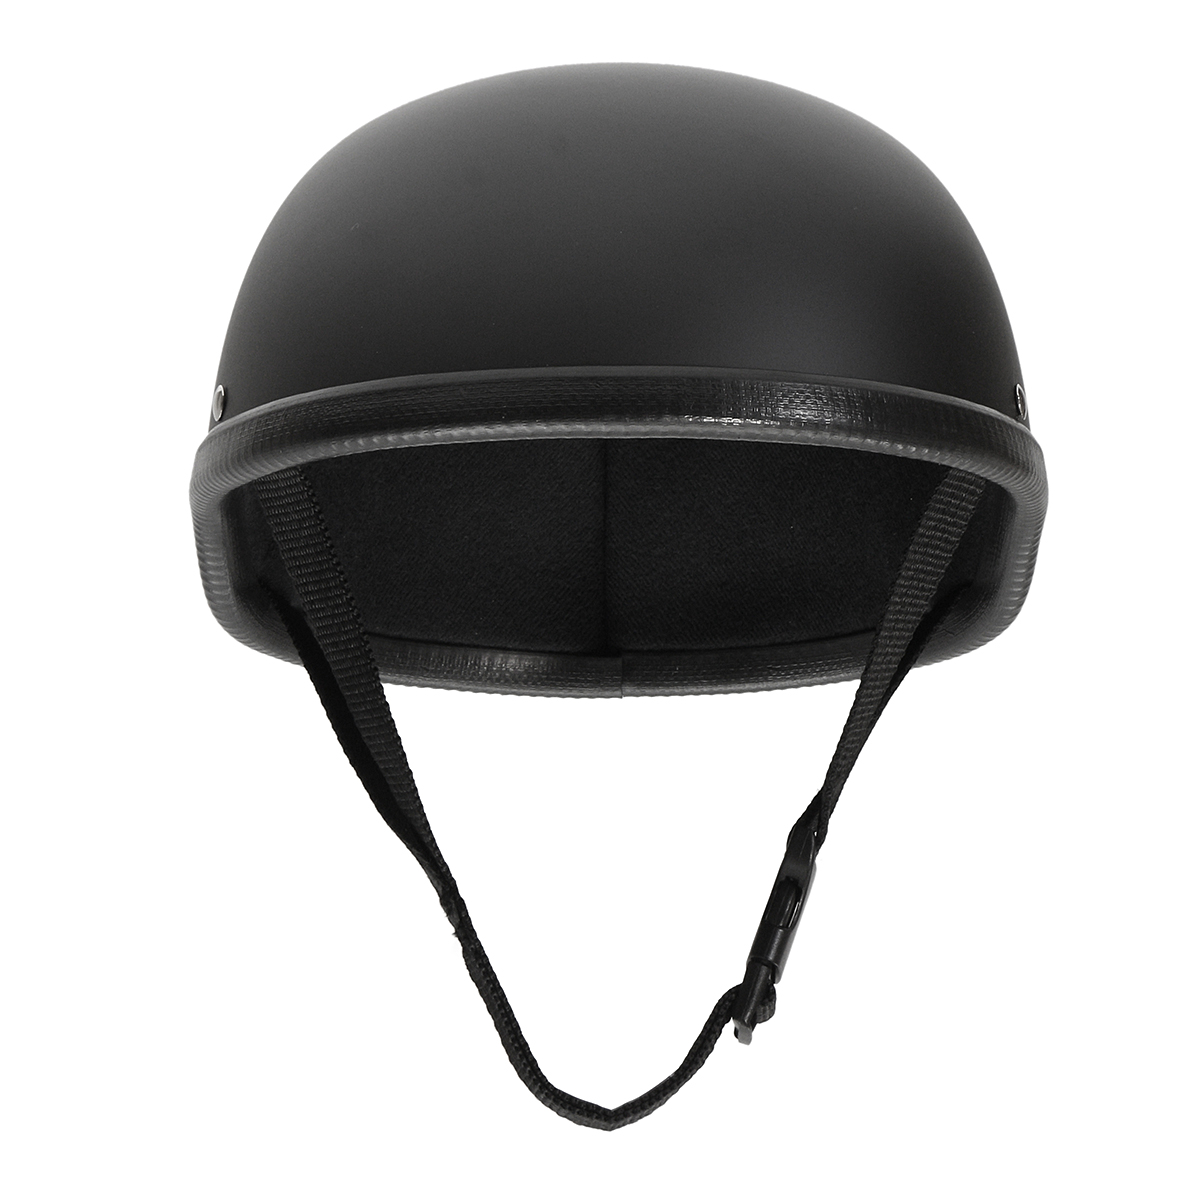 Motorcycle Helmet Vintage Half Face Cap Matte Black For Harley Chopper